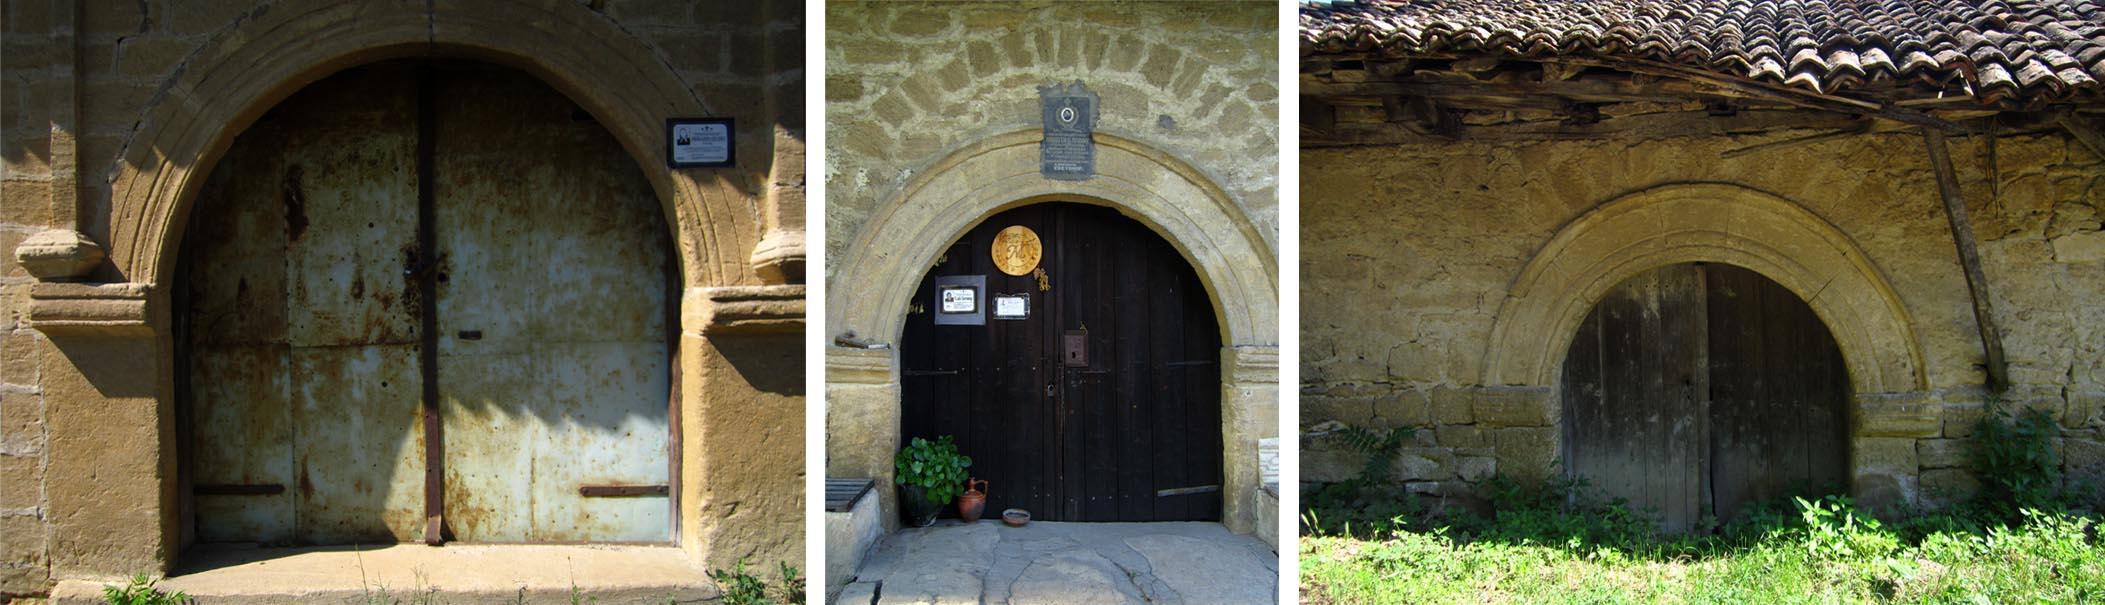 15 rogljevacke pimnice